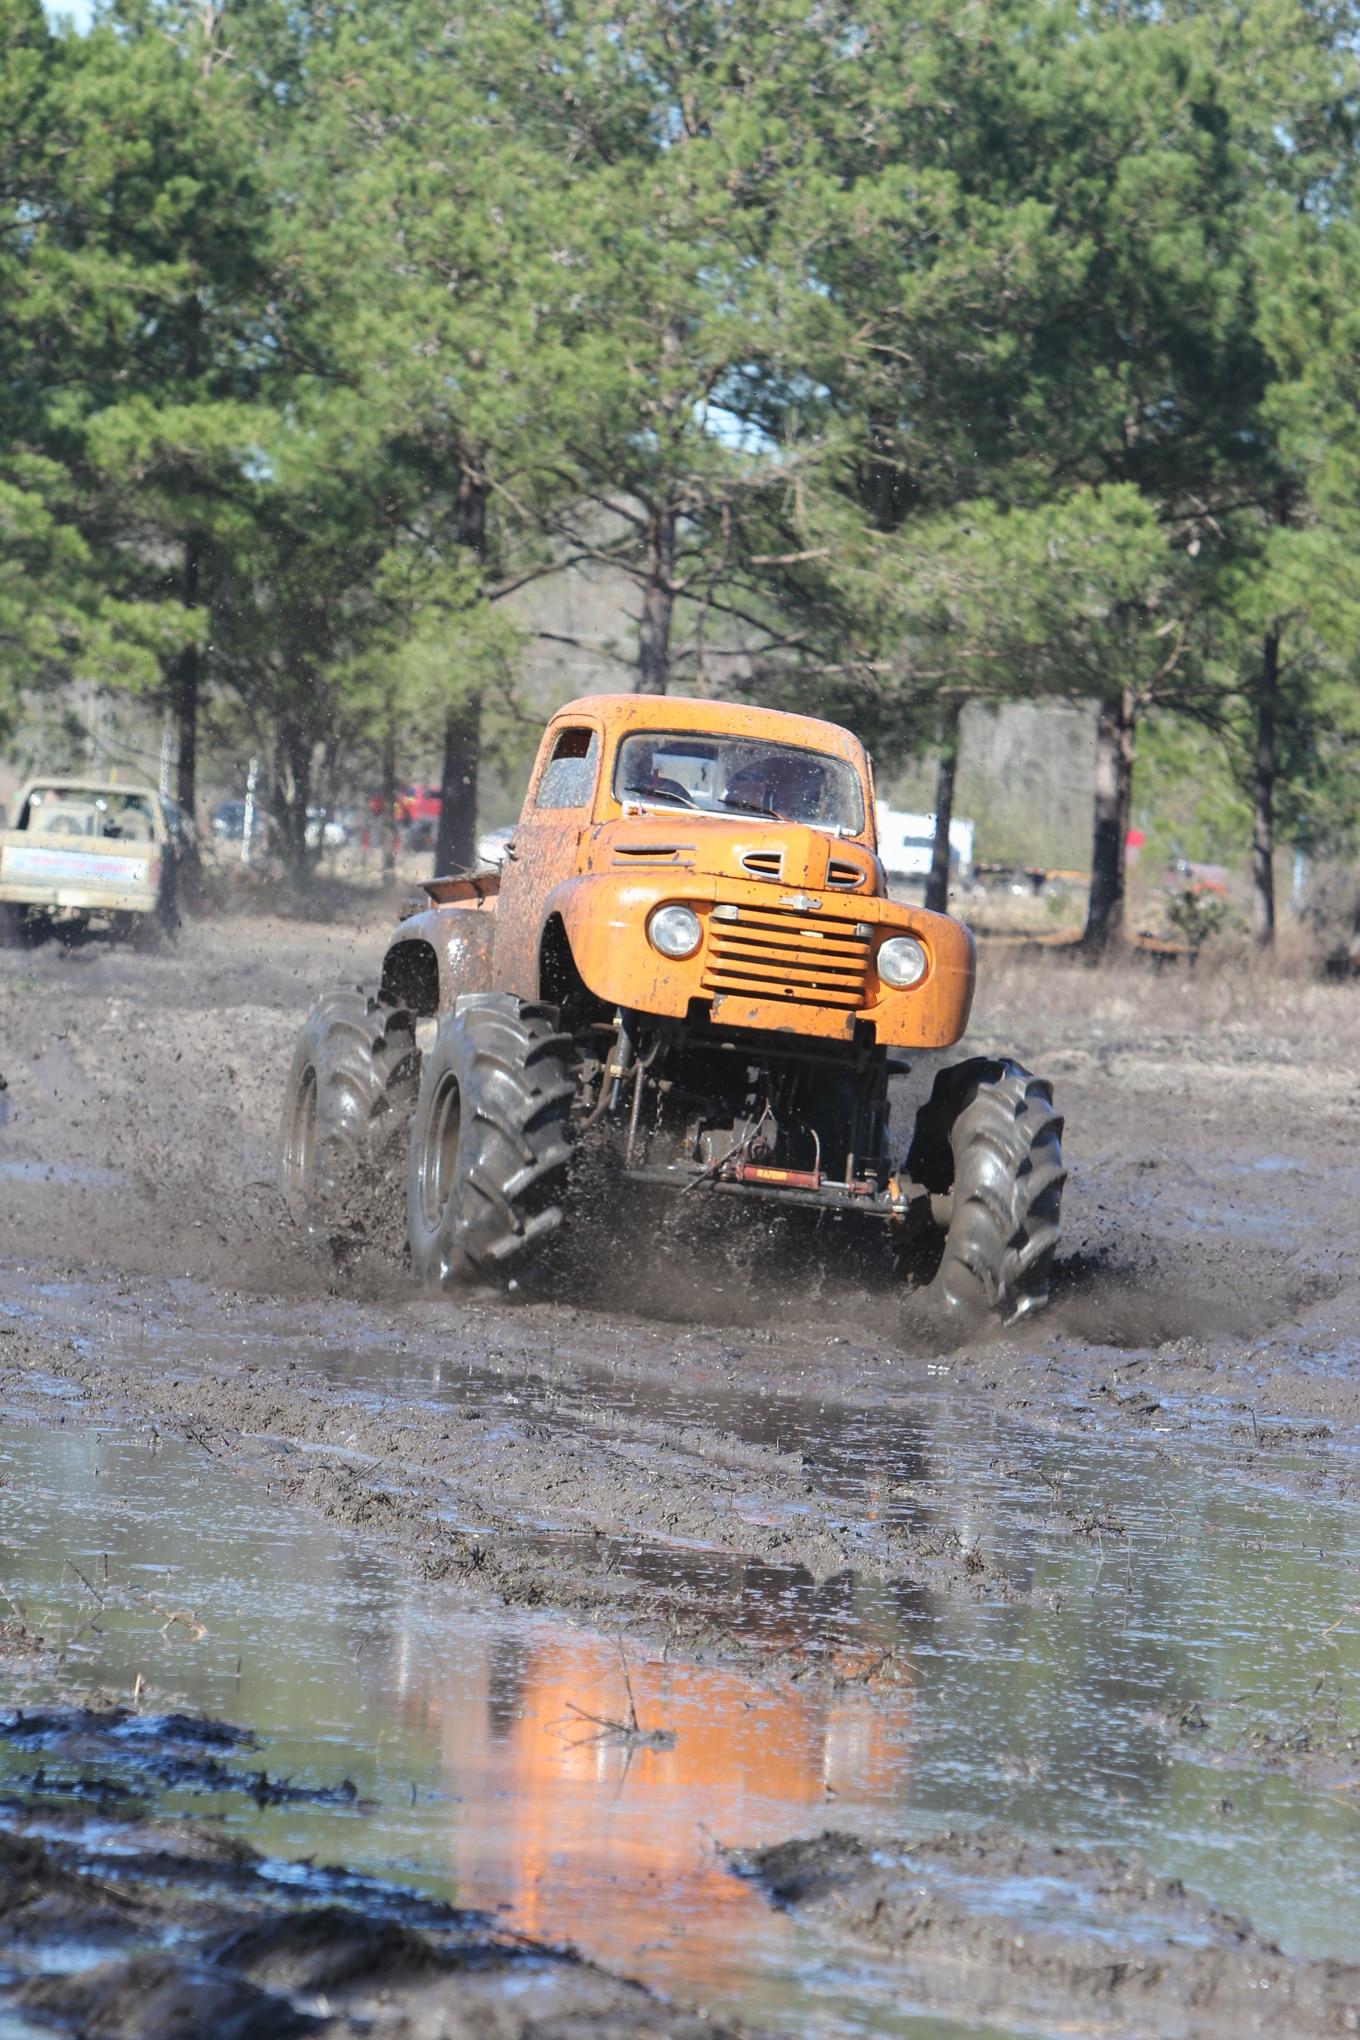 140 south berlin mud ranch 2016